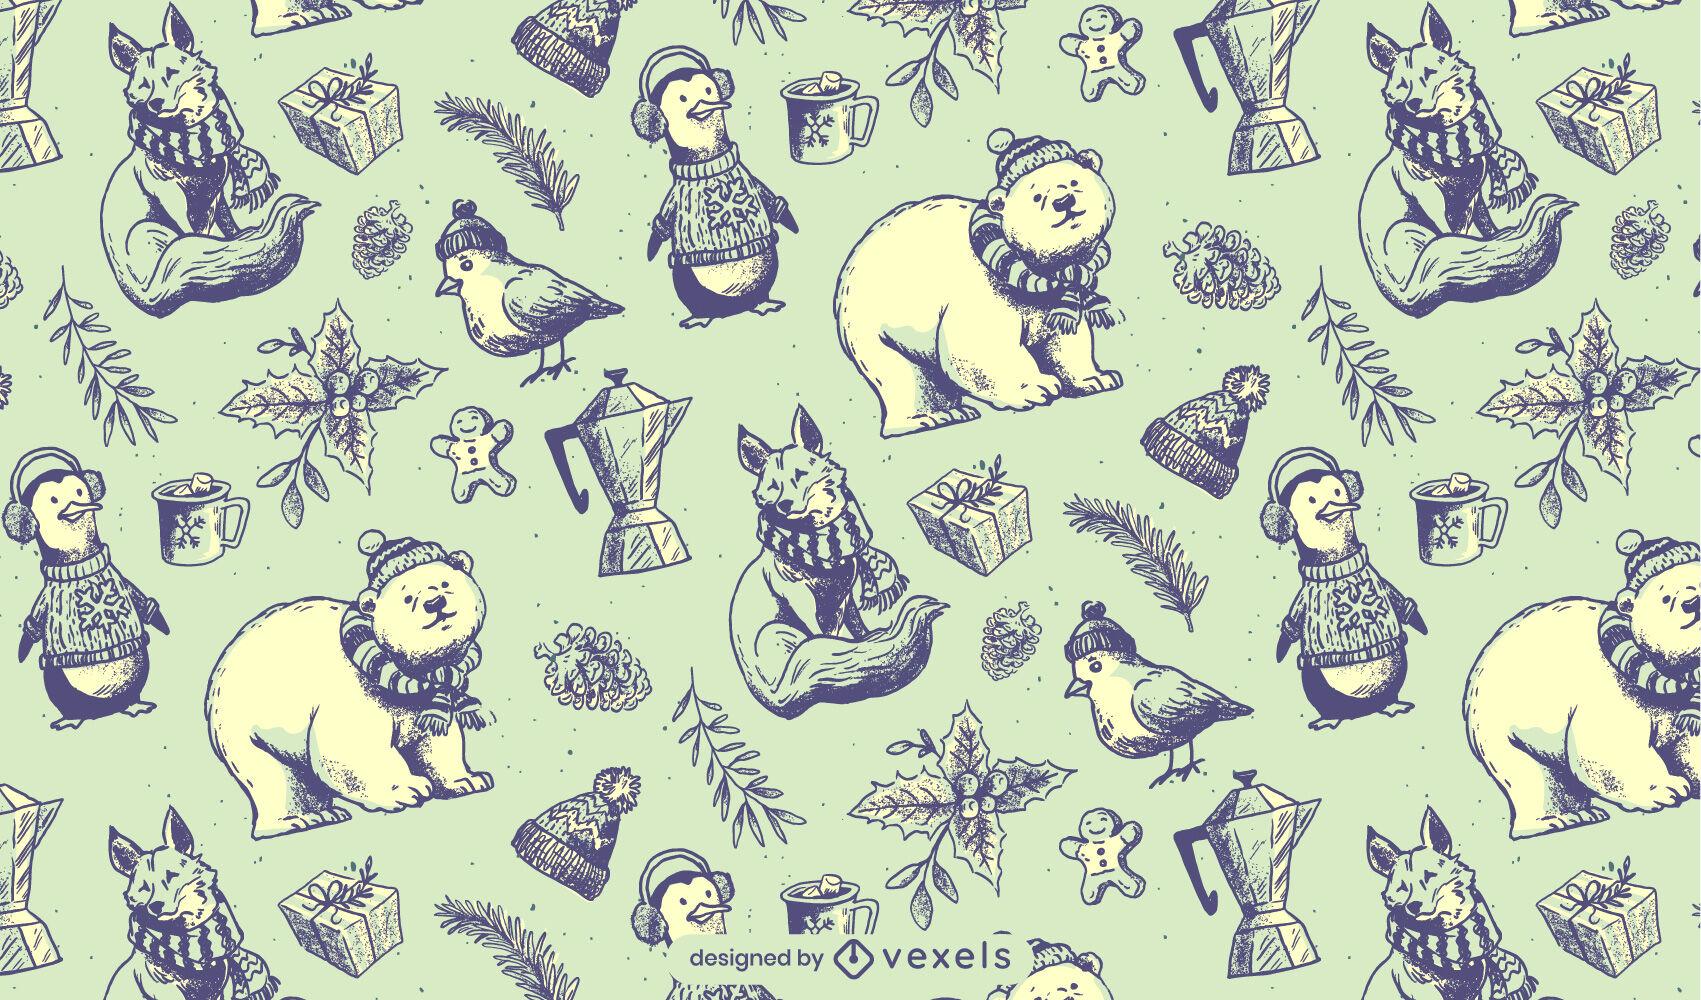 Winter season wild animals pattern design